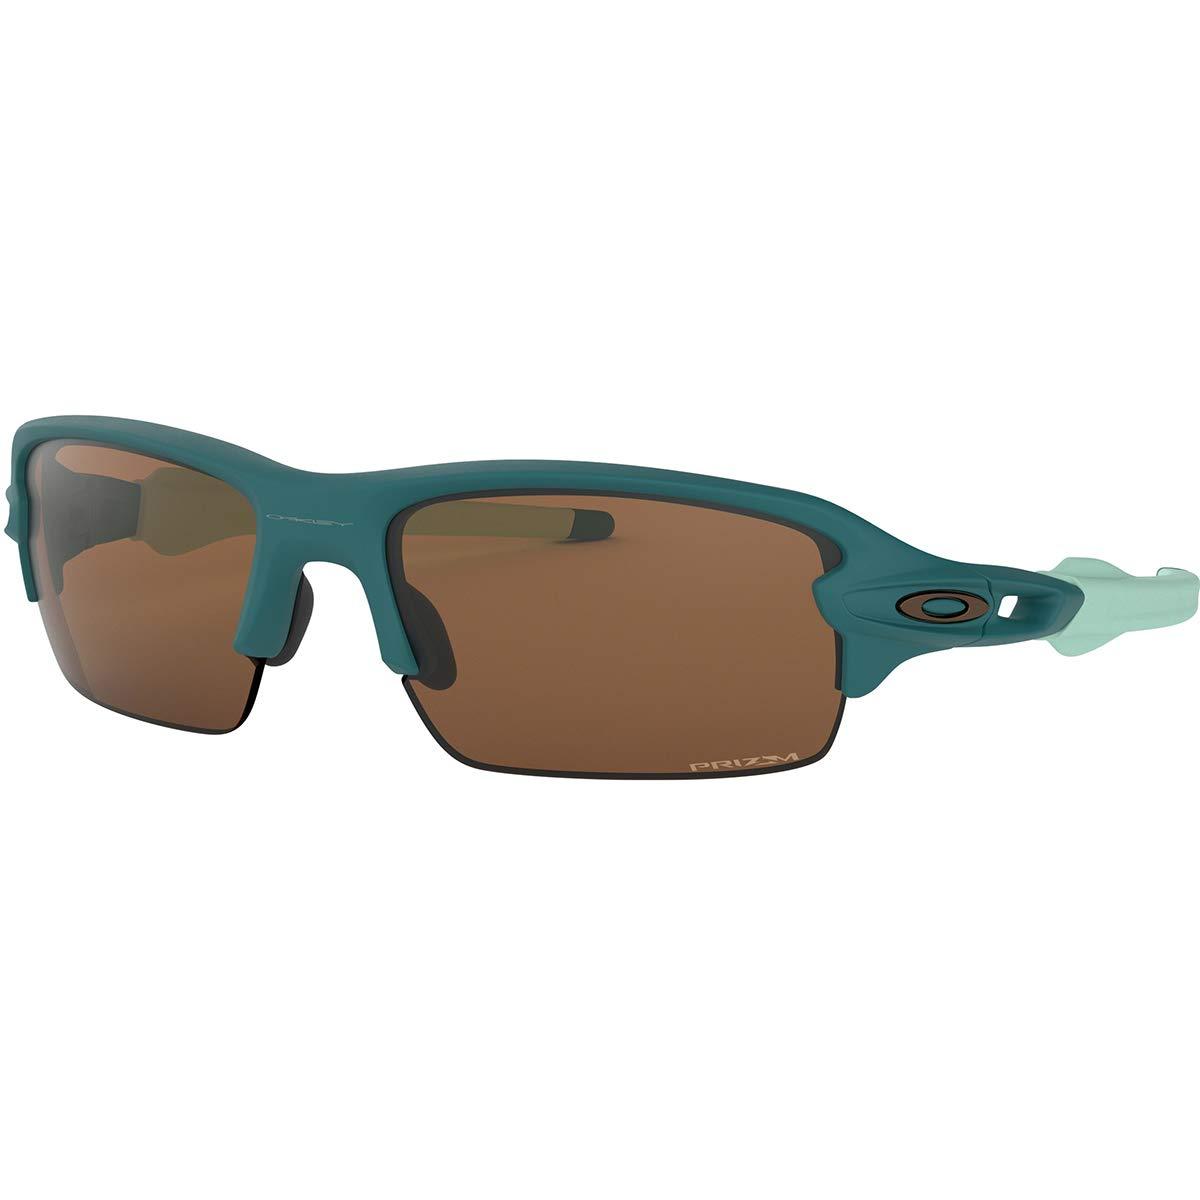 Oakley Men's Flak XS Sunglasses,OS,Matte Balsam/Prizm Tungsten by Oakley